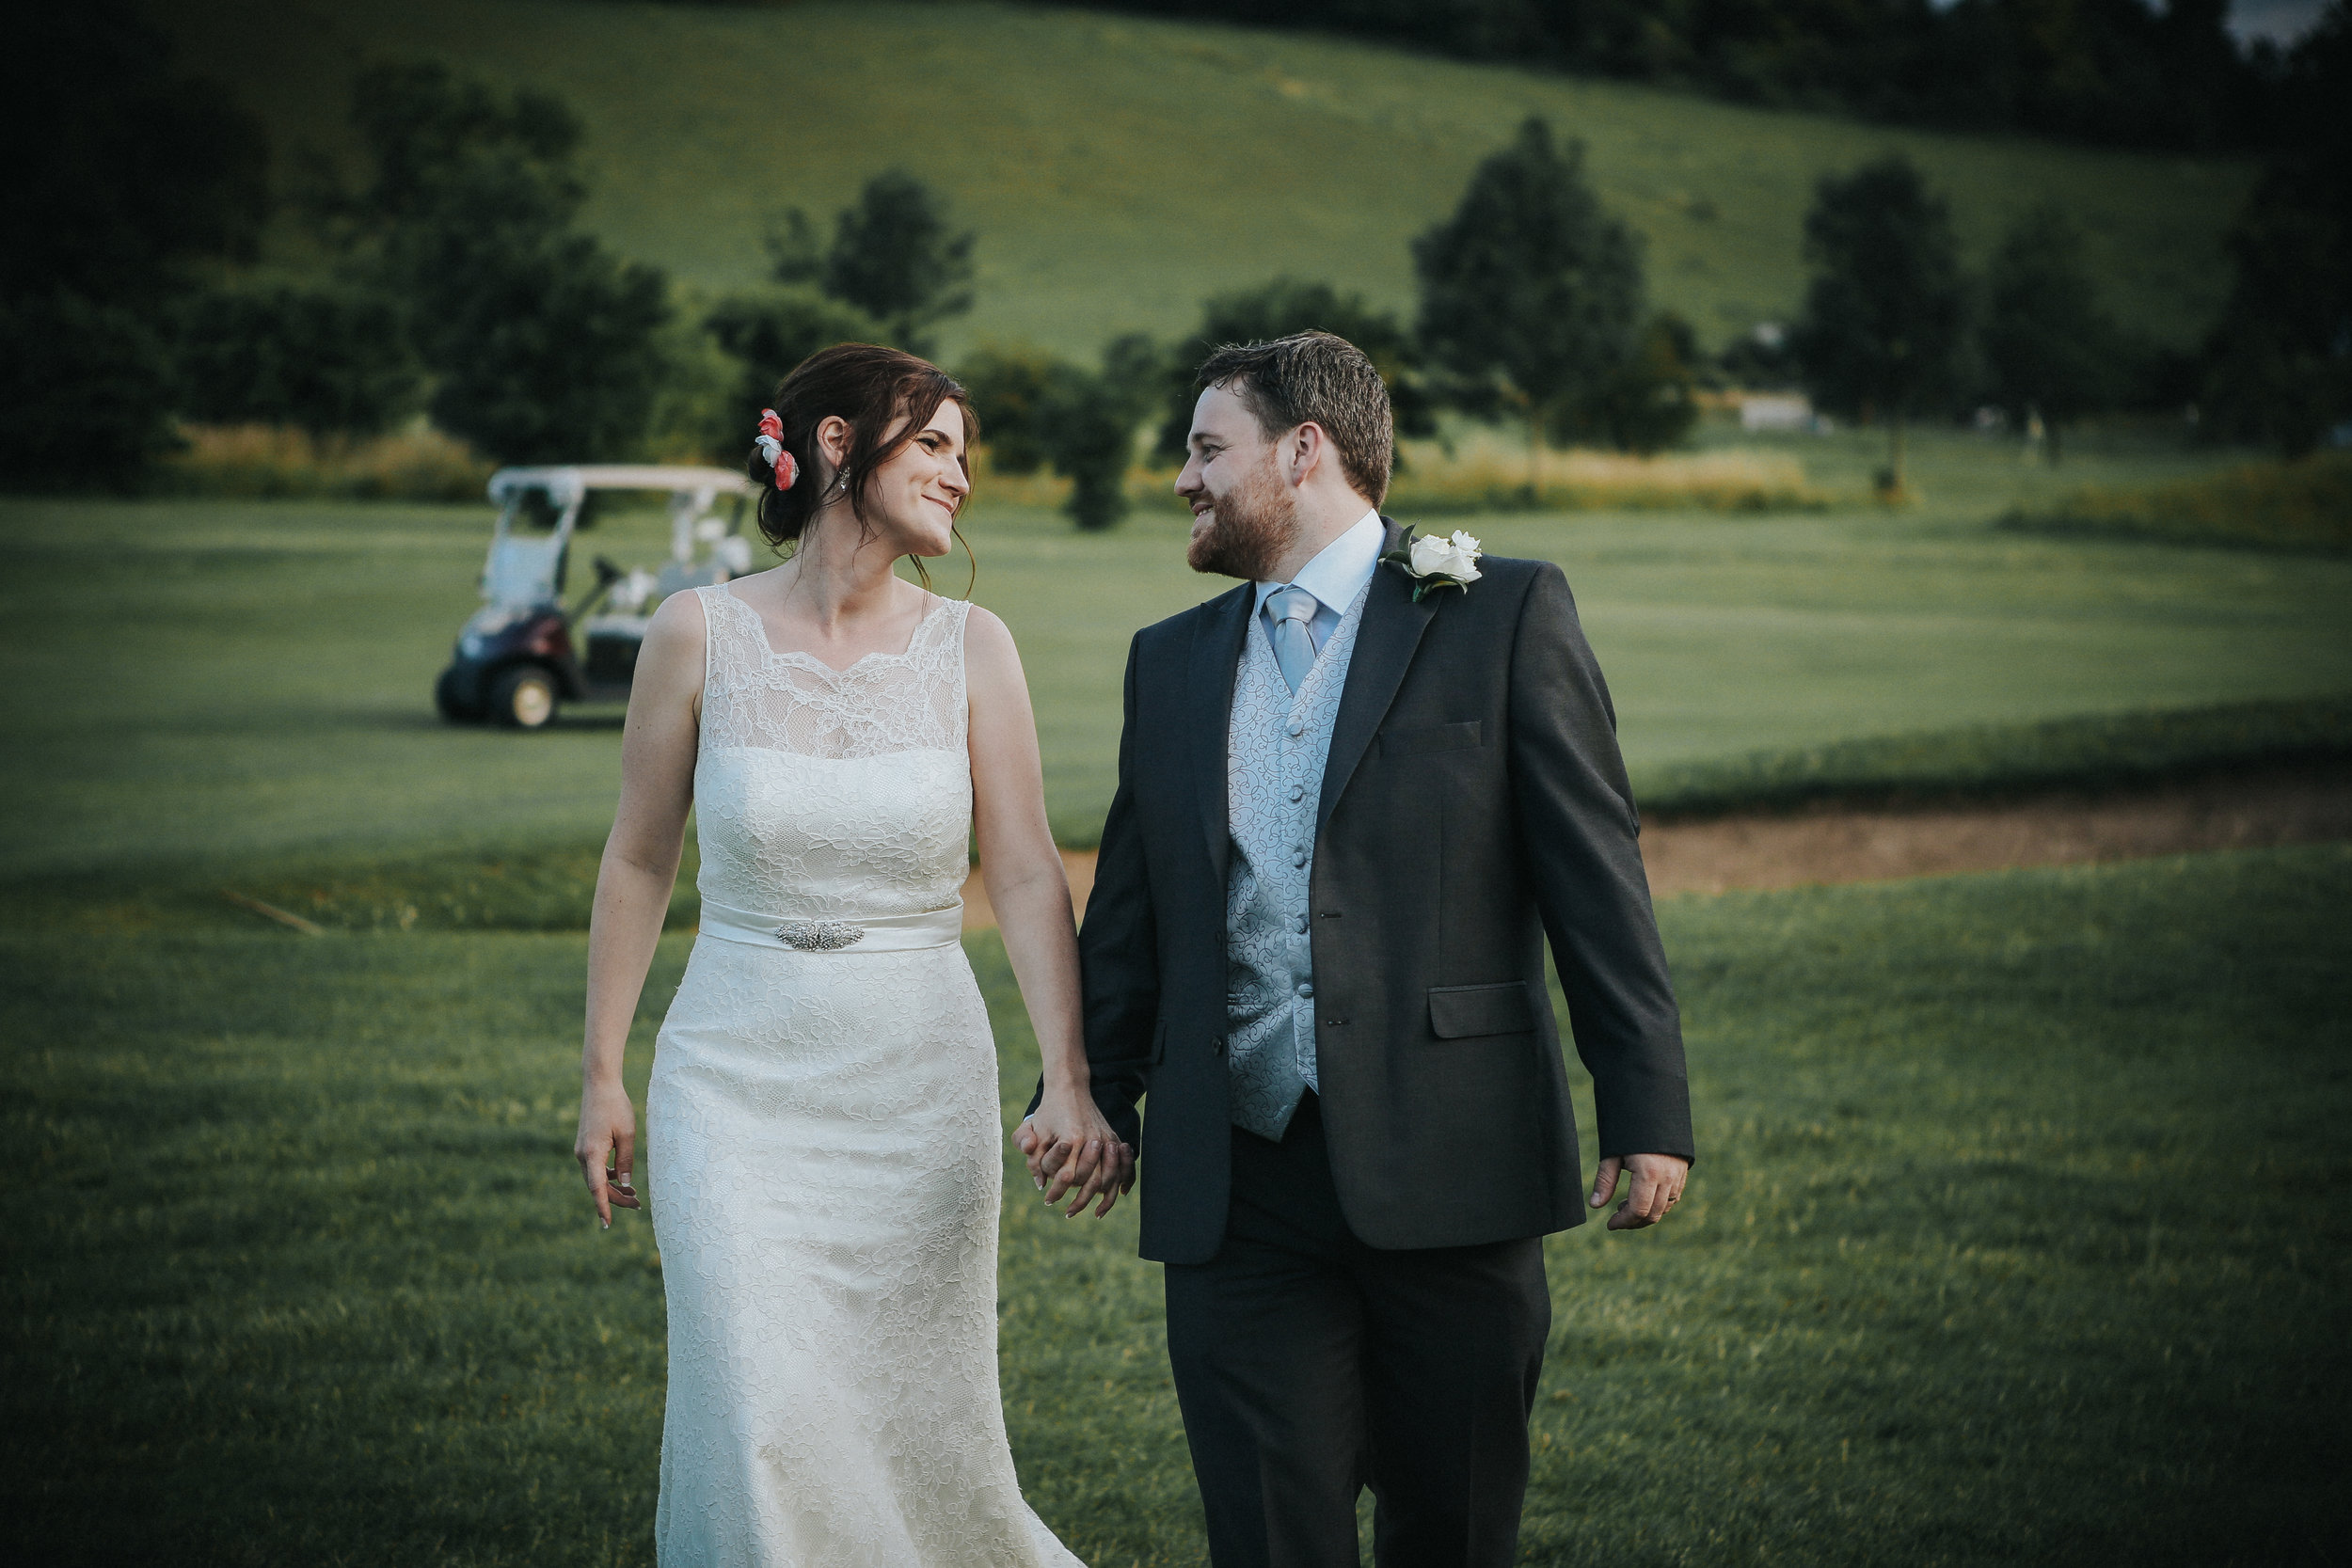 reigate-surrey-london-wedding-photography-group-formal-shot-reception-woldingham-golf-club-bridal-portrait-102